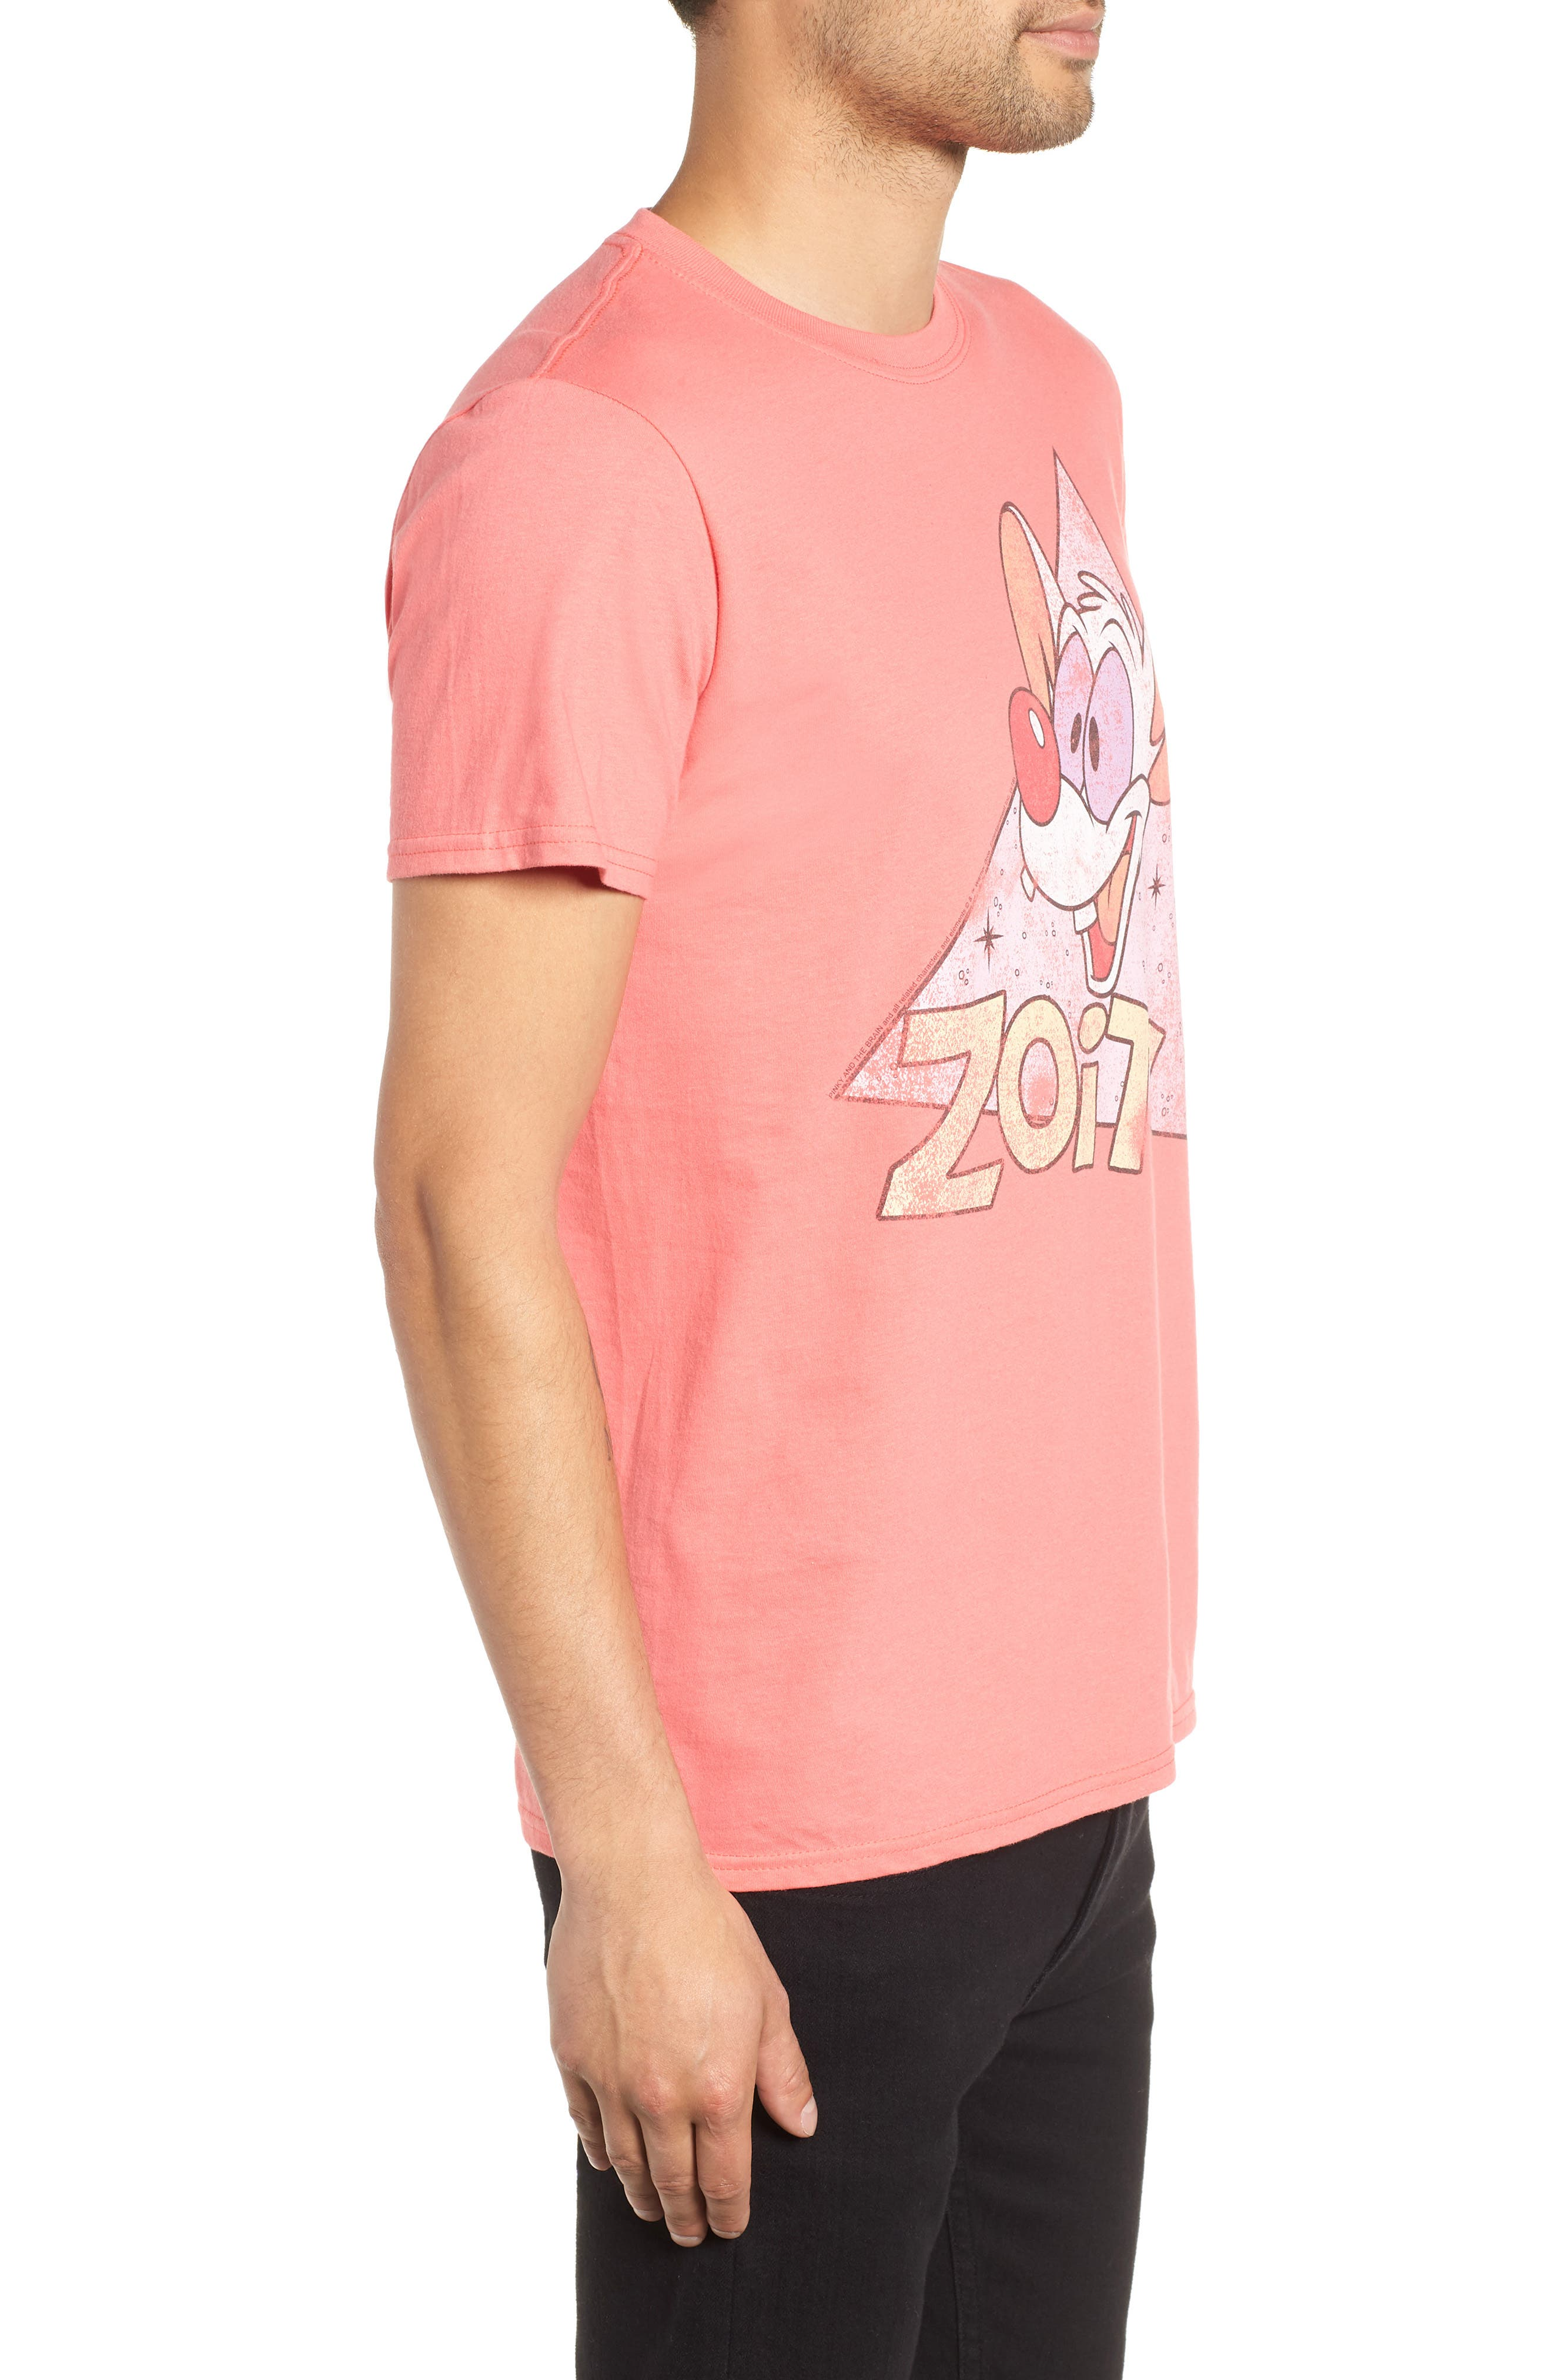 Zoit Graphic T-Shirt,                             Alternate thumbnail 3, color,                             CORAL ZOIT